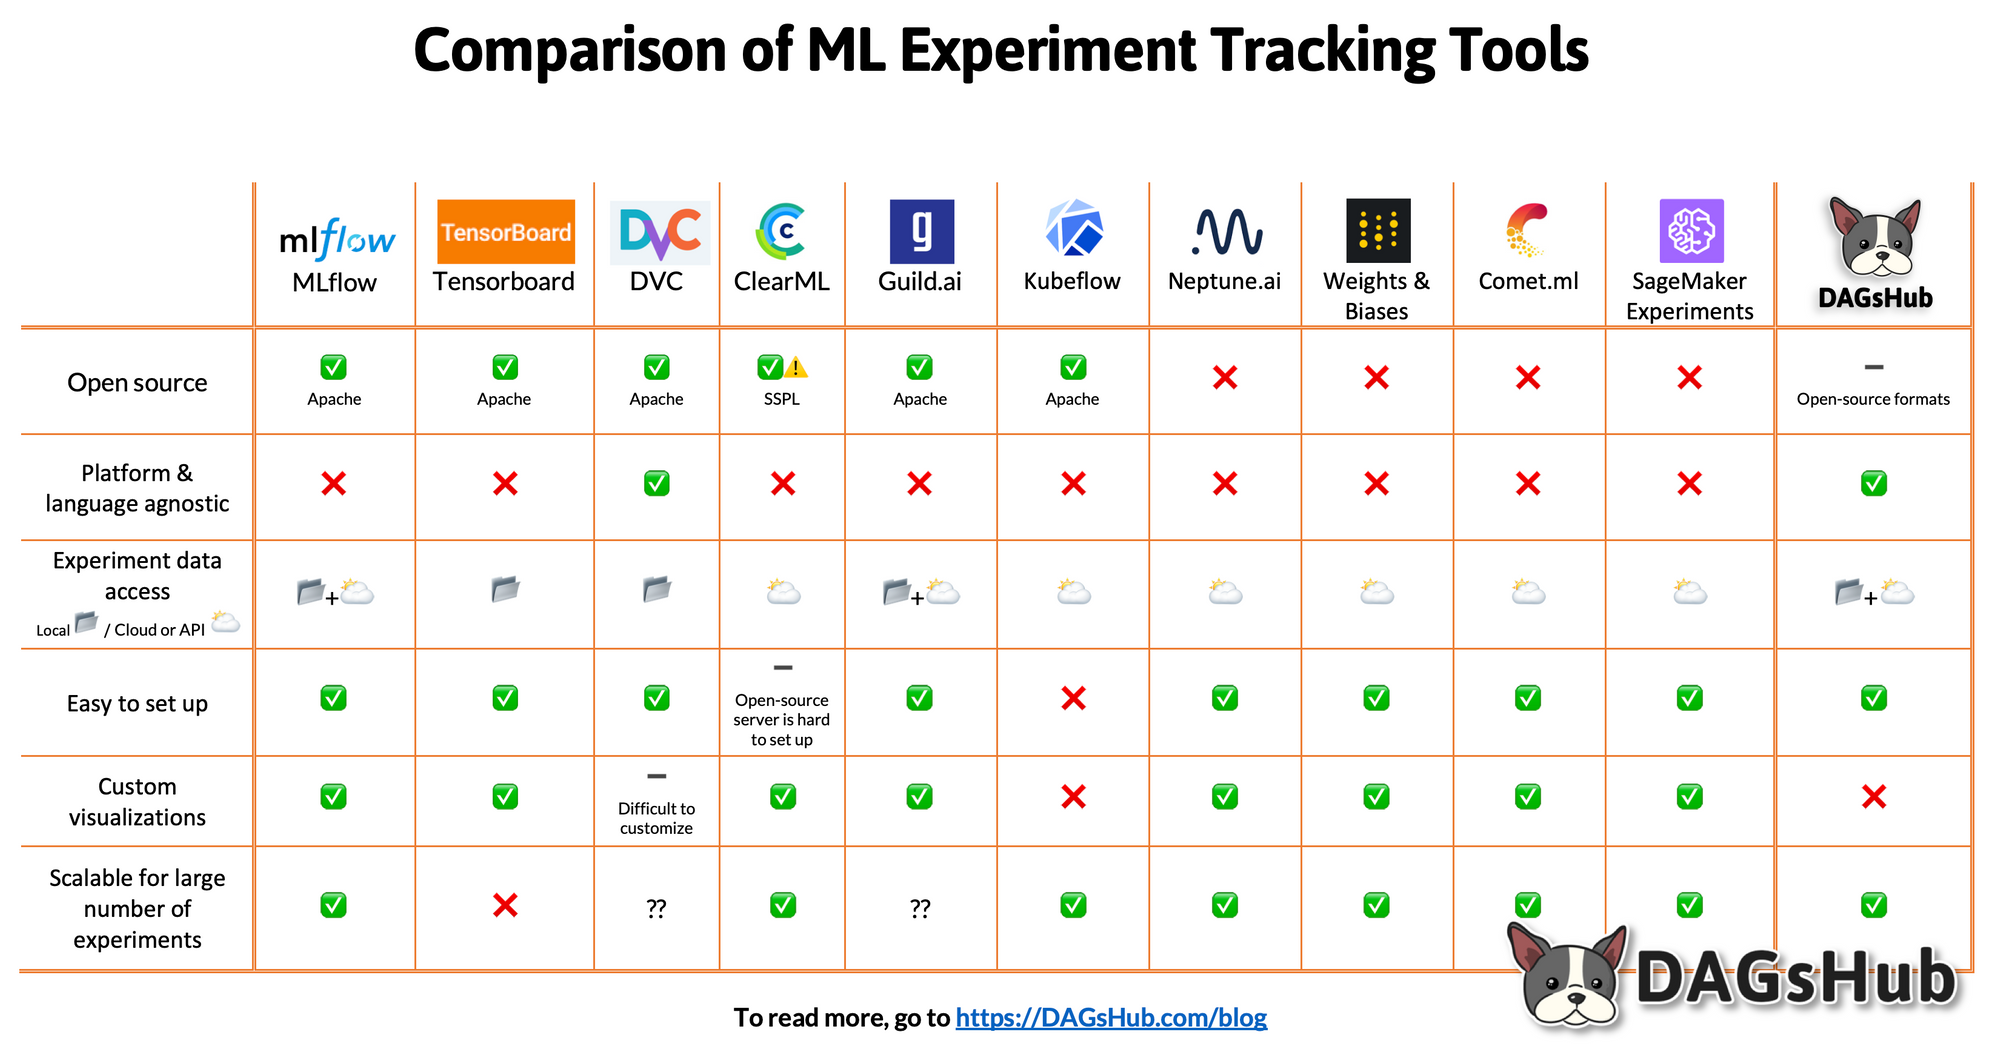 Comparison ML Experiment Tracking Tools